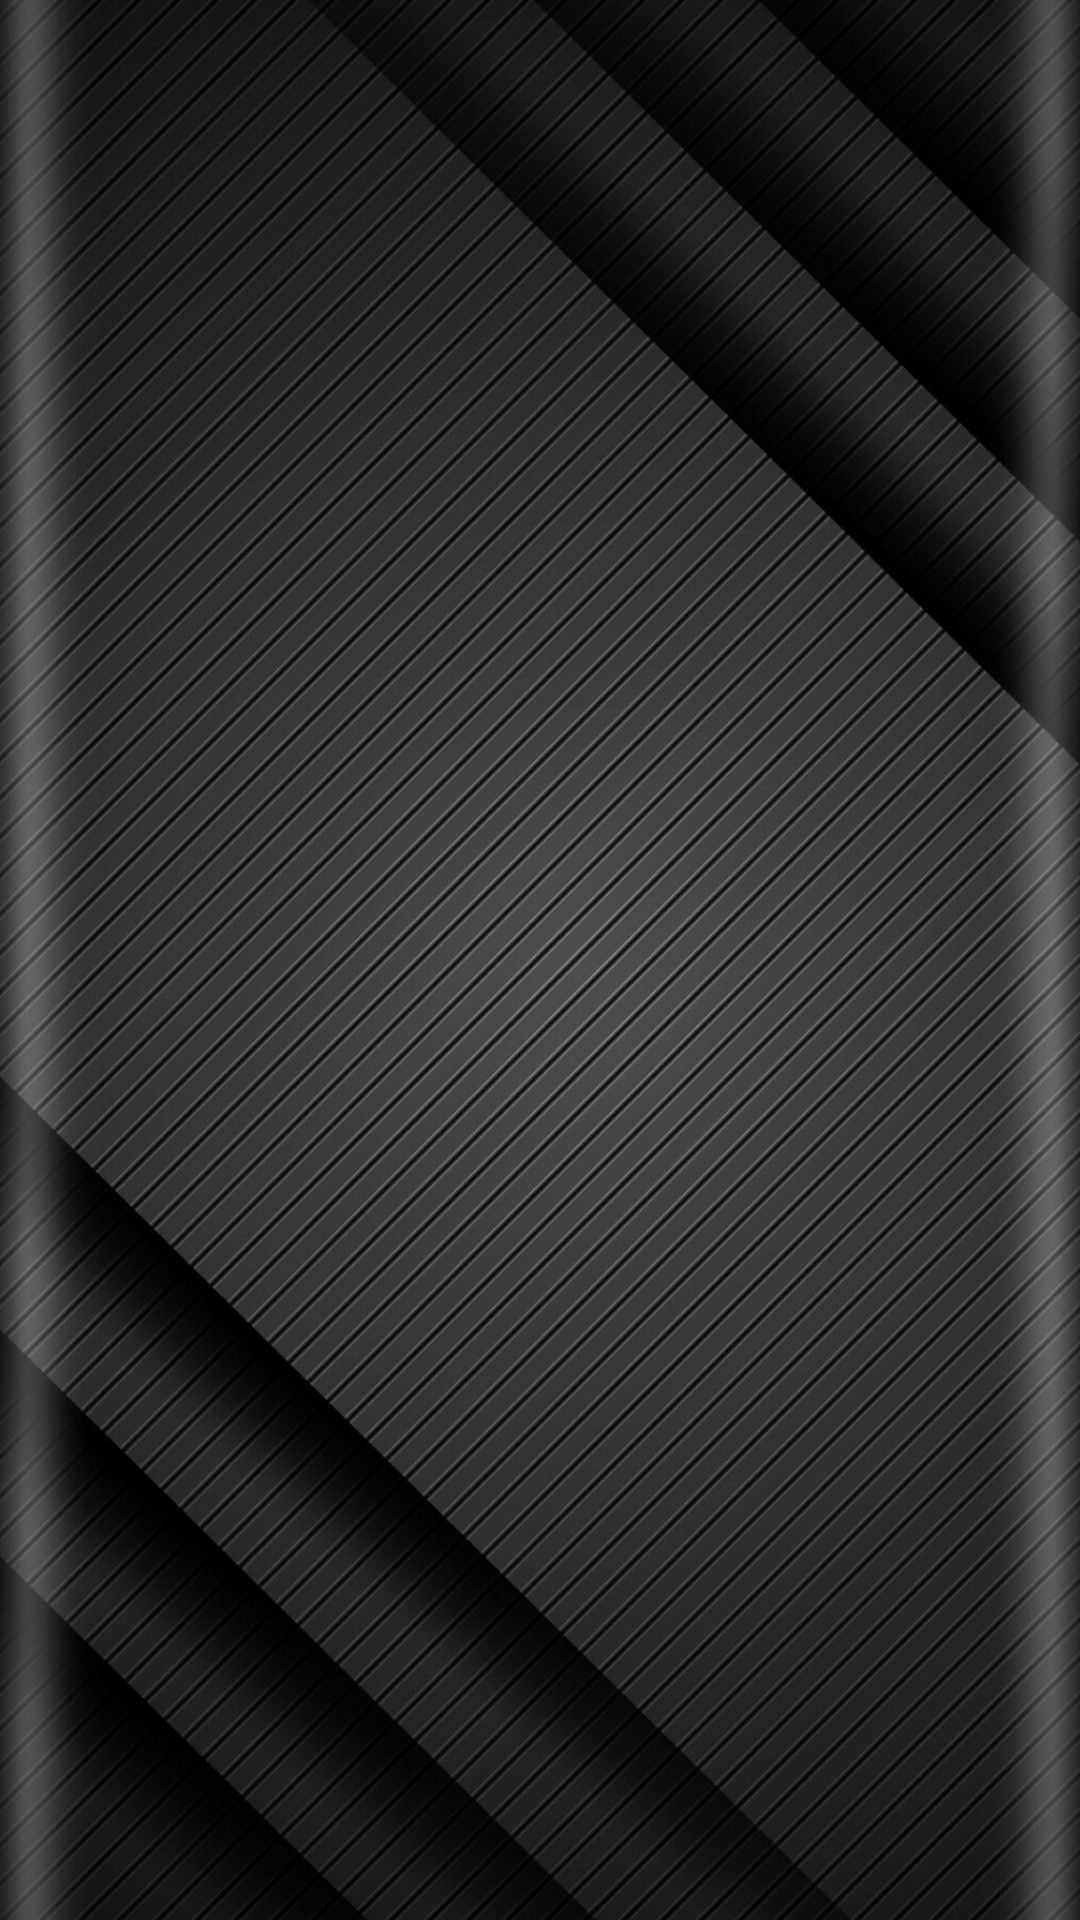 Wallpaper In Black Dark Color Textures Background For Mobile Phone Papel De Parede Smartphone Cartazes Criativos Papeis De Parede